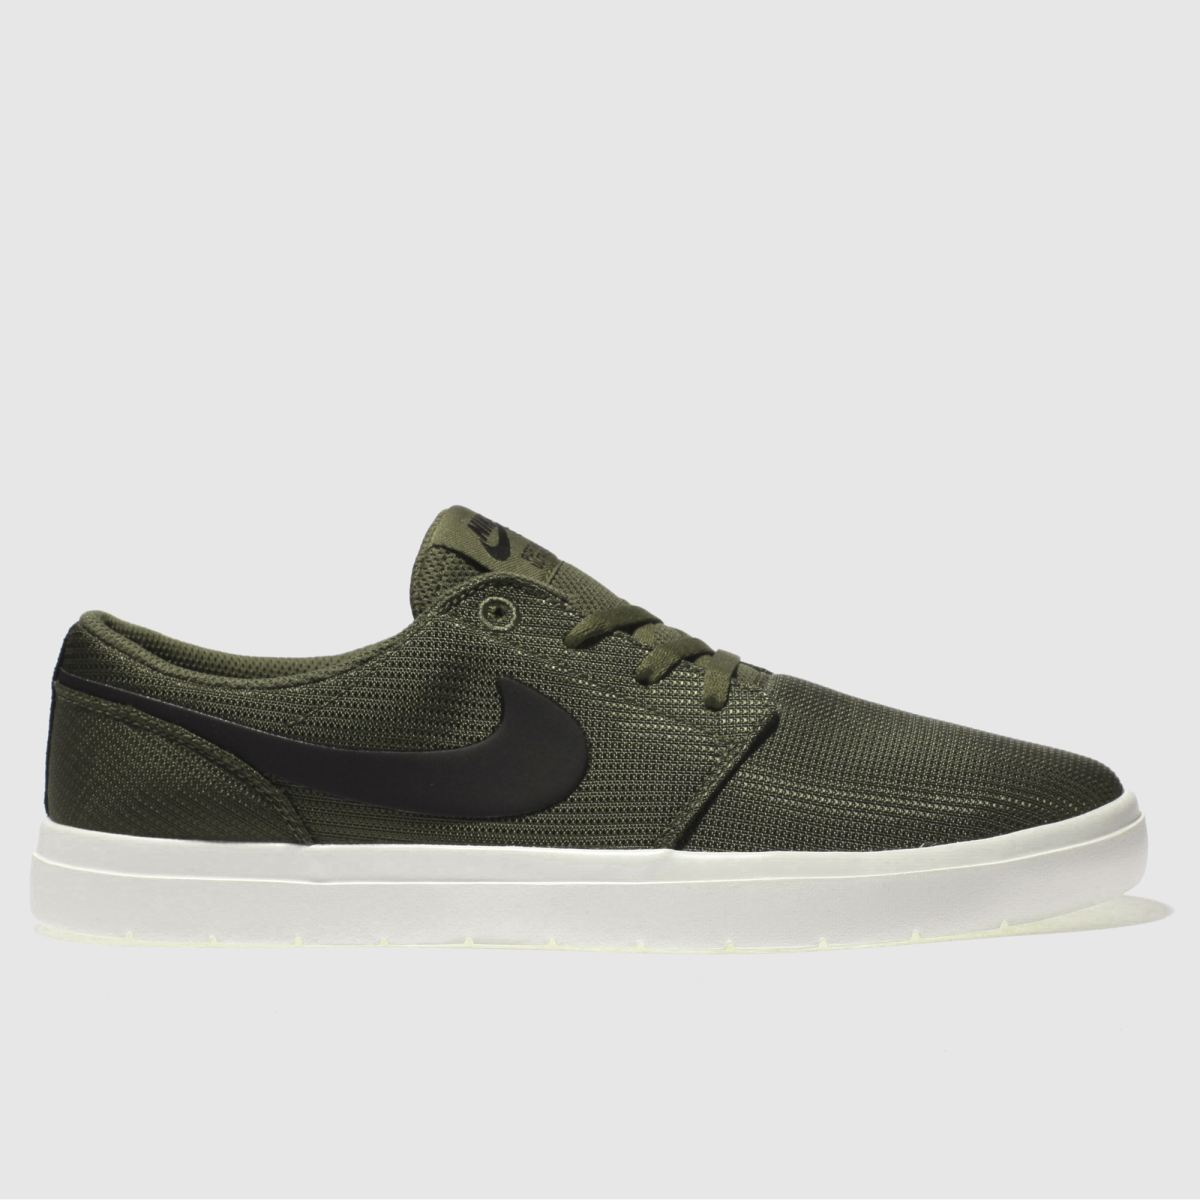 Nike Sb Khaki Portmore Ii Ultralight Trainers